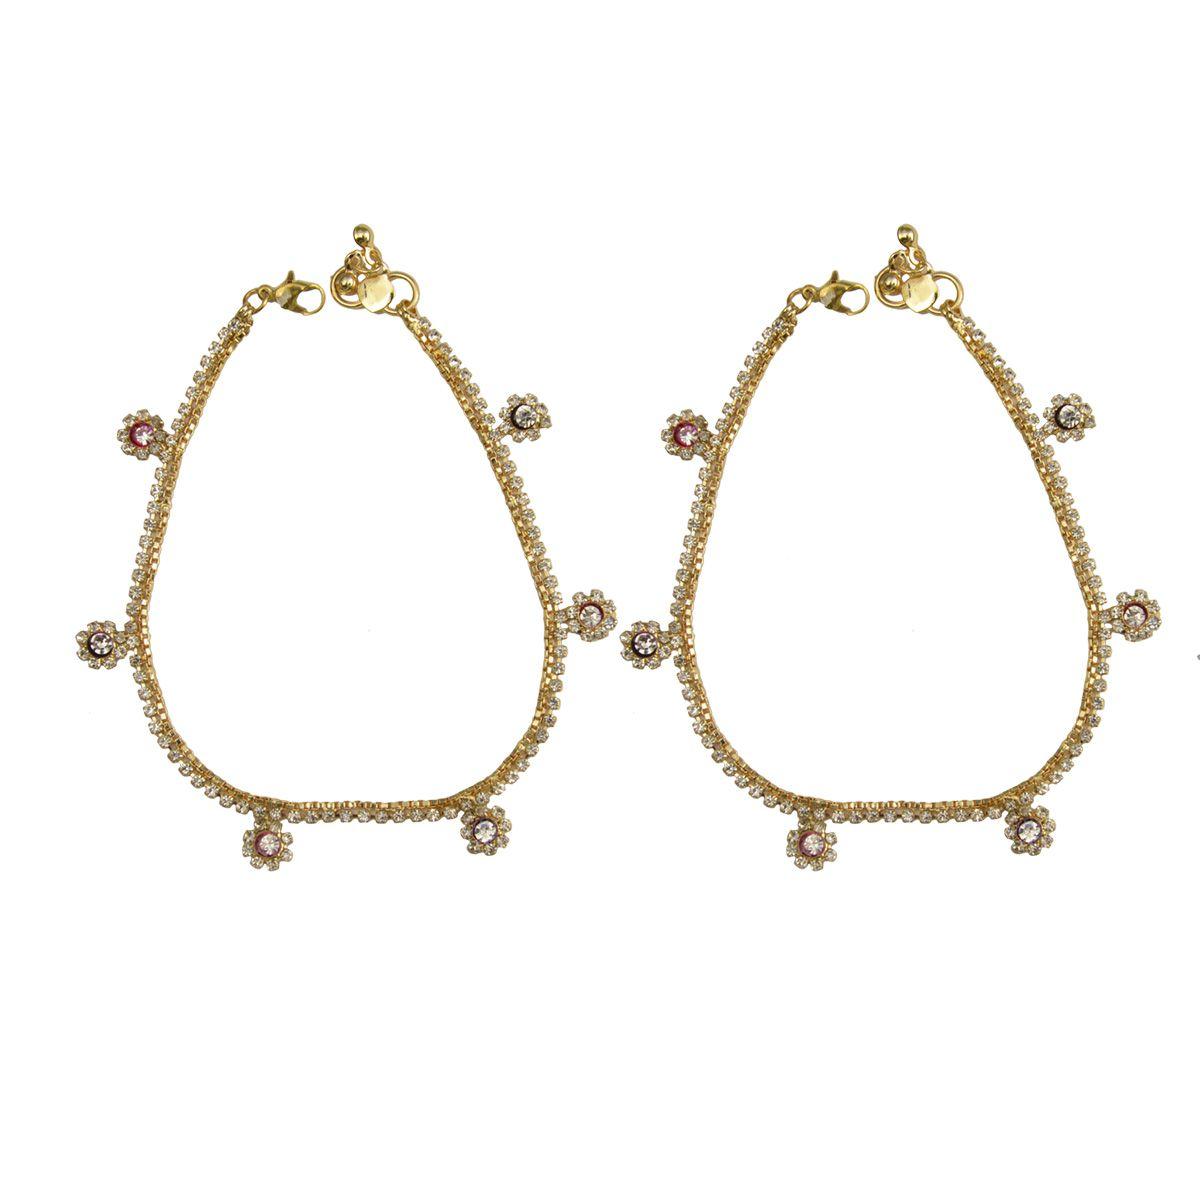 Rabia Taj Pearl Gold plated Anklets